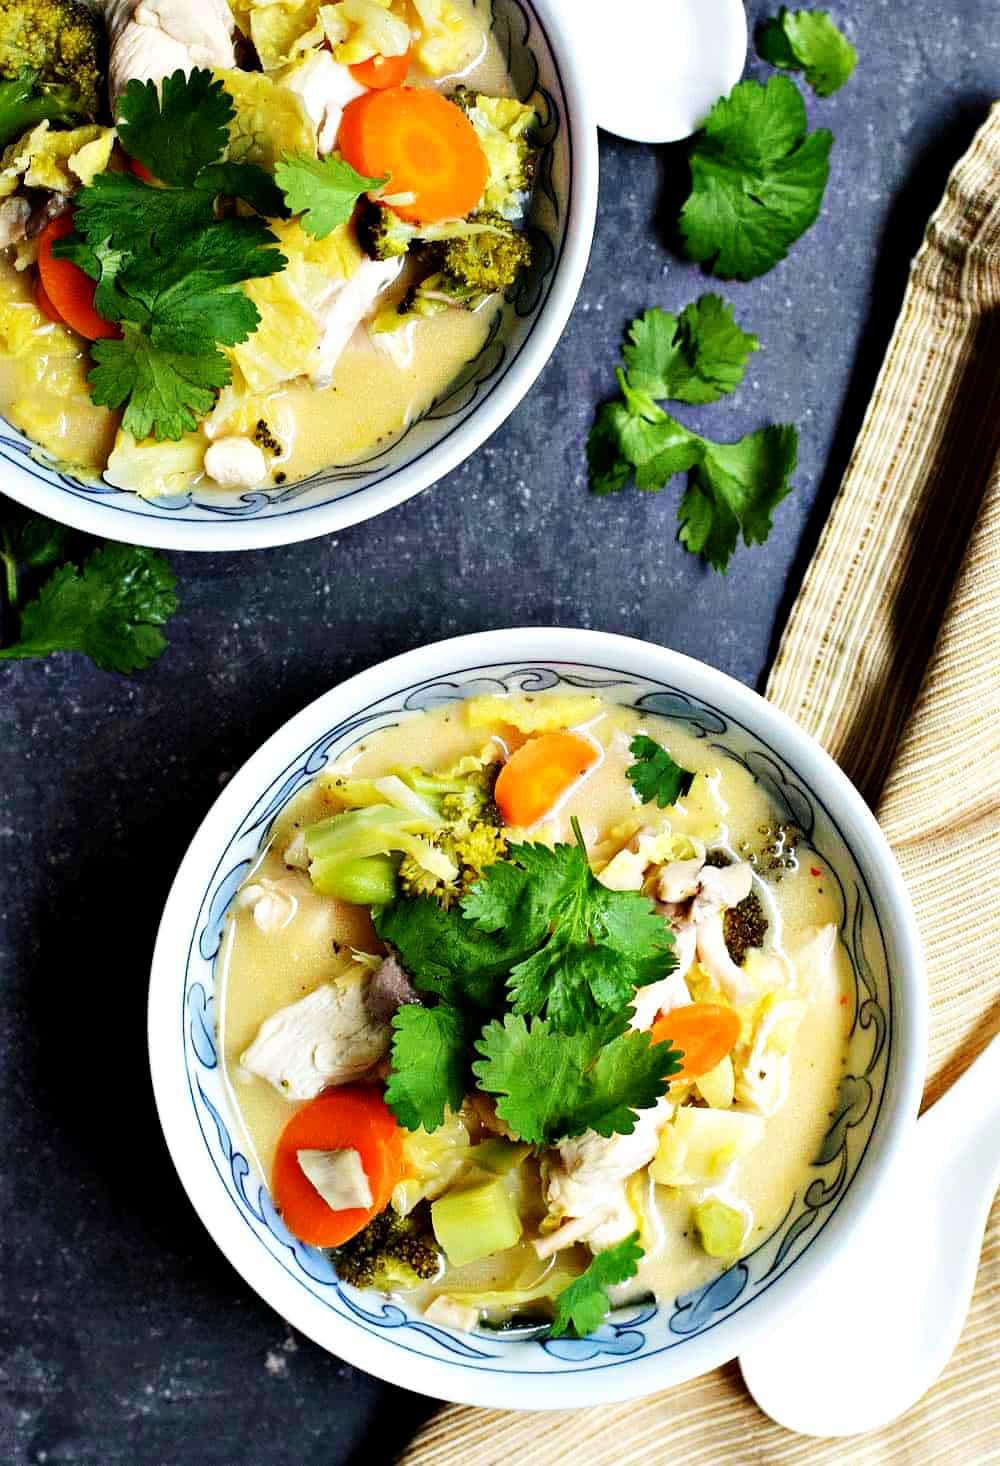 Tom-Kha-Gai-Soup-served in patterned bowls